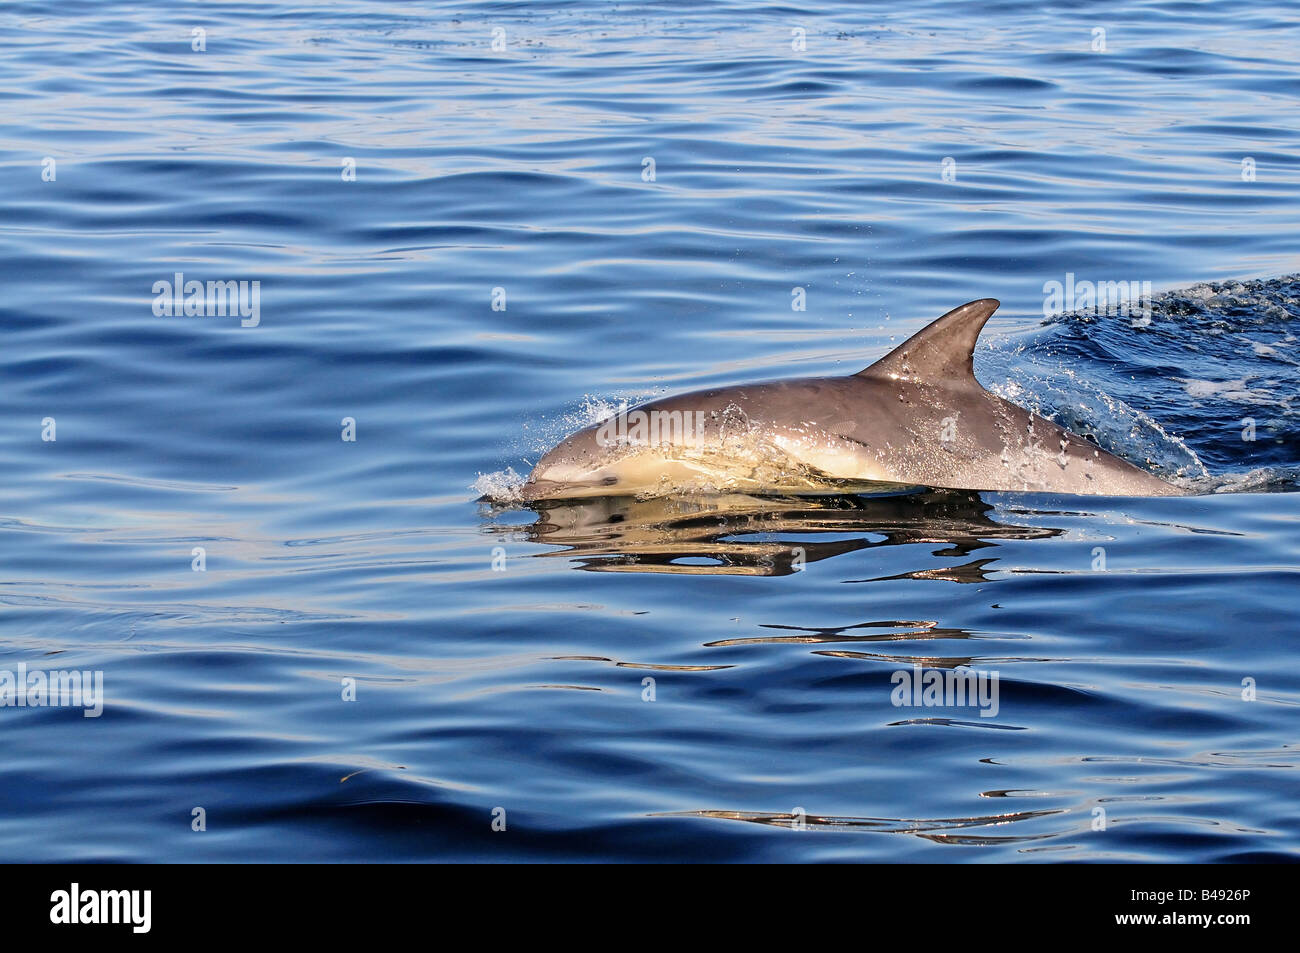 common dolphin delphinus delphis in european waters - Stock Image